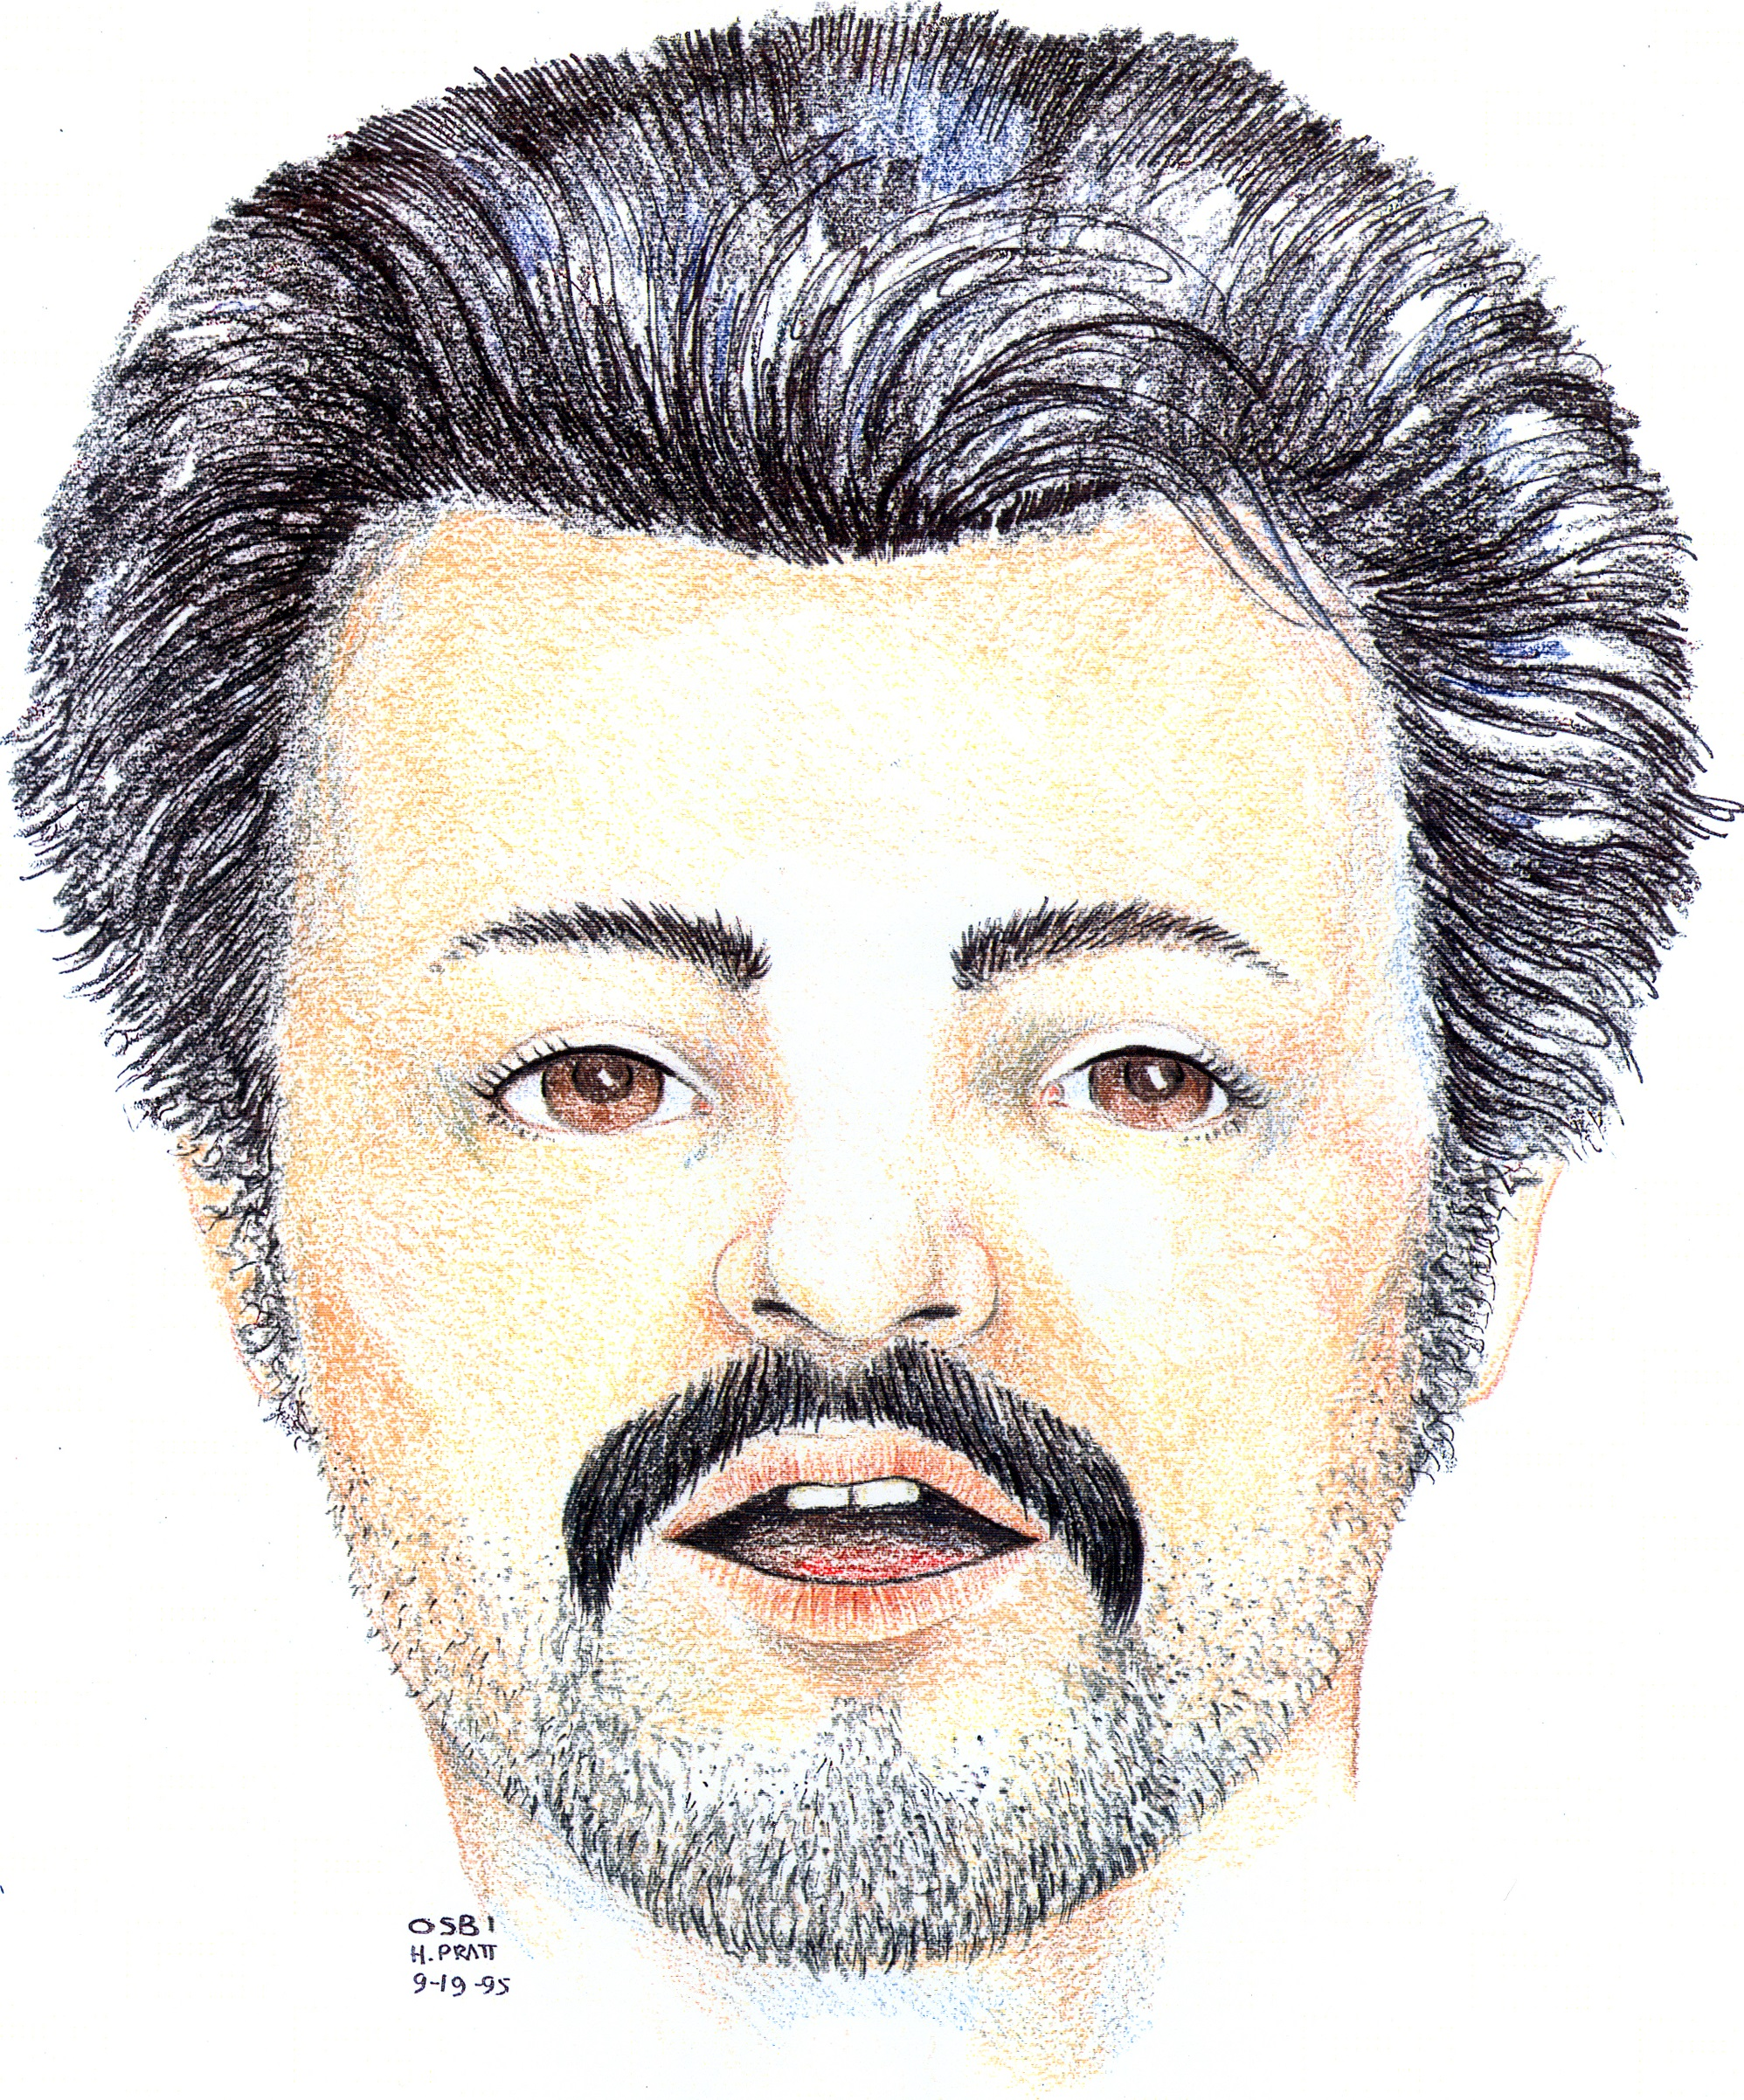 Collier County John Doe (1997)